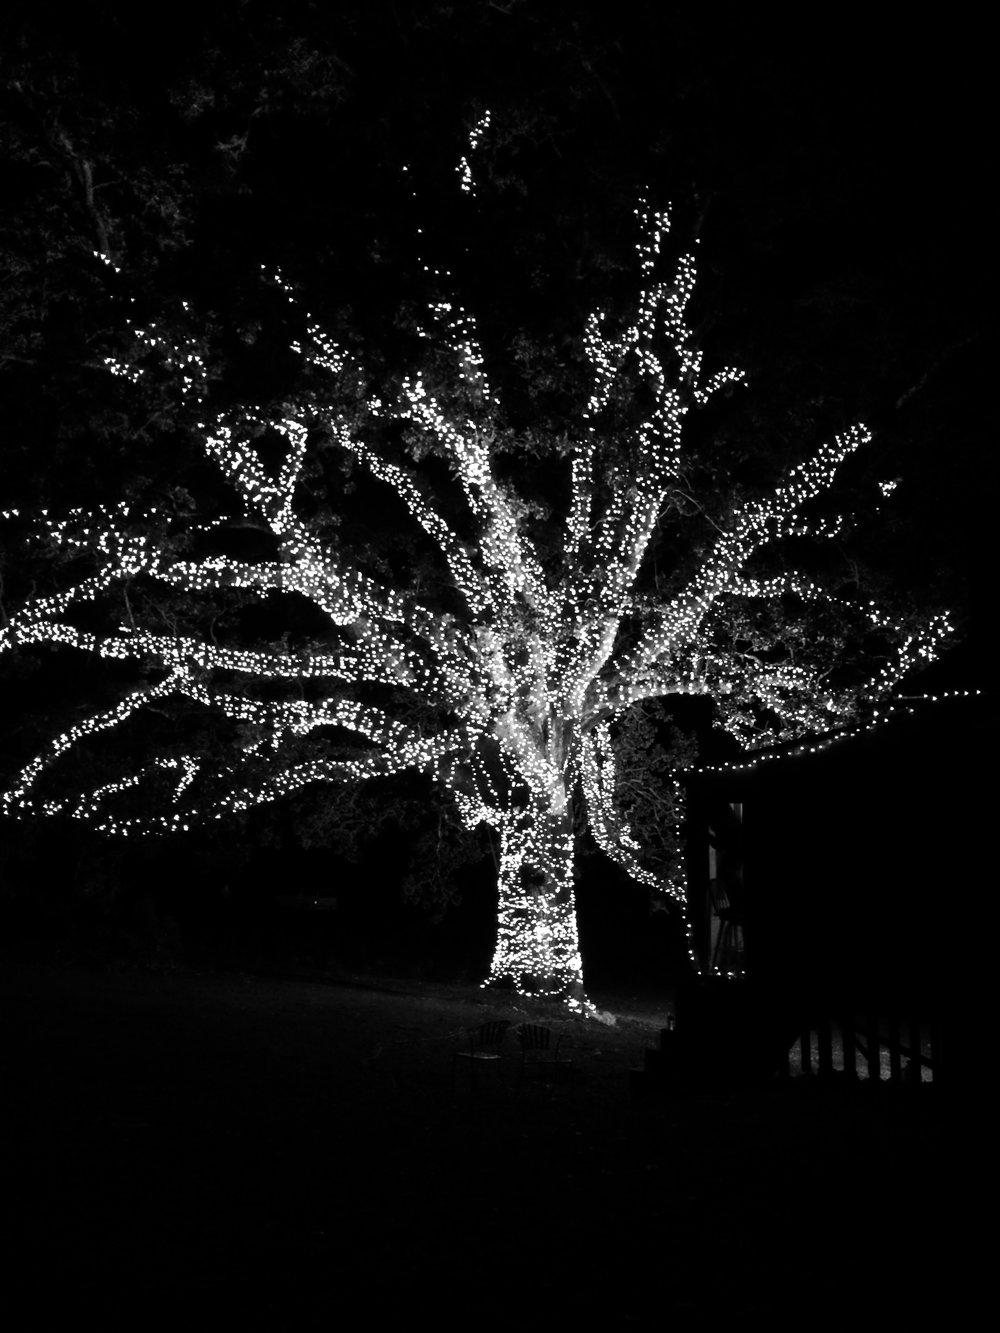 Stella Tree BW.jpg